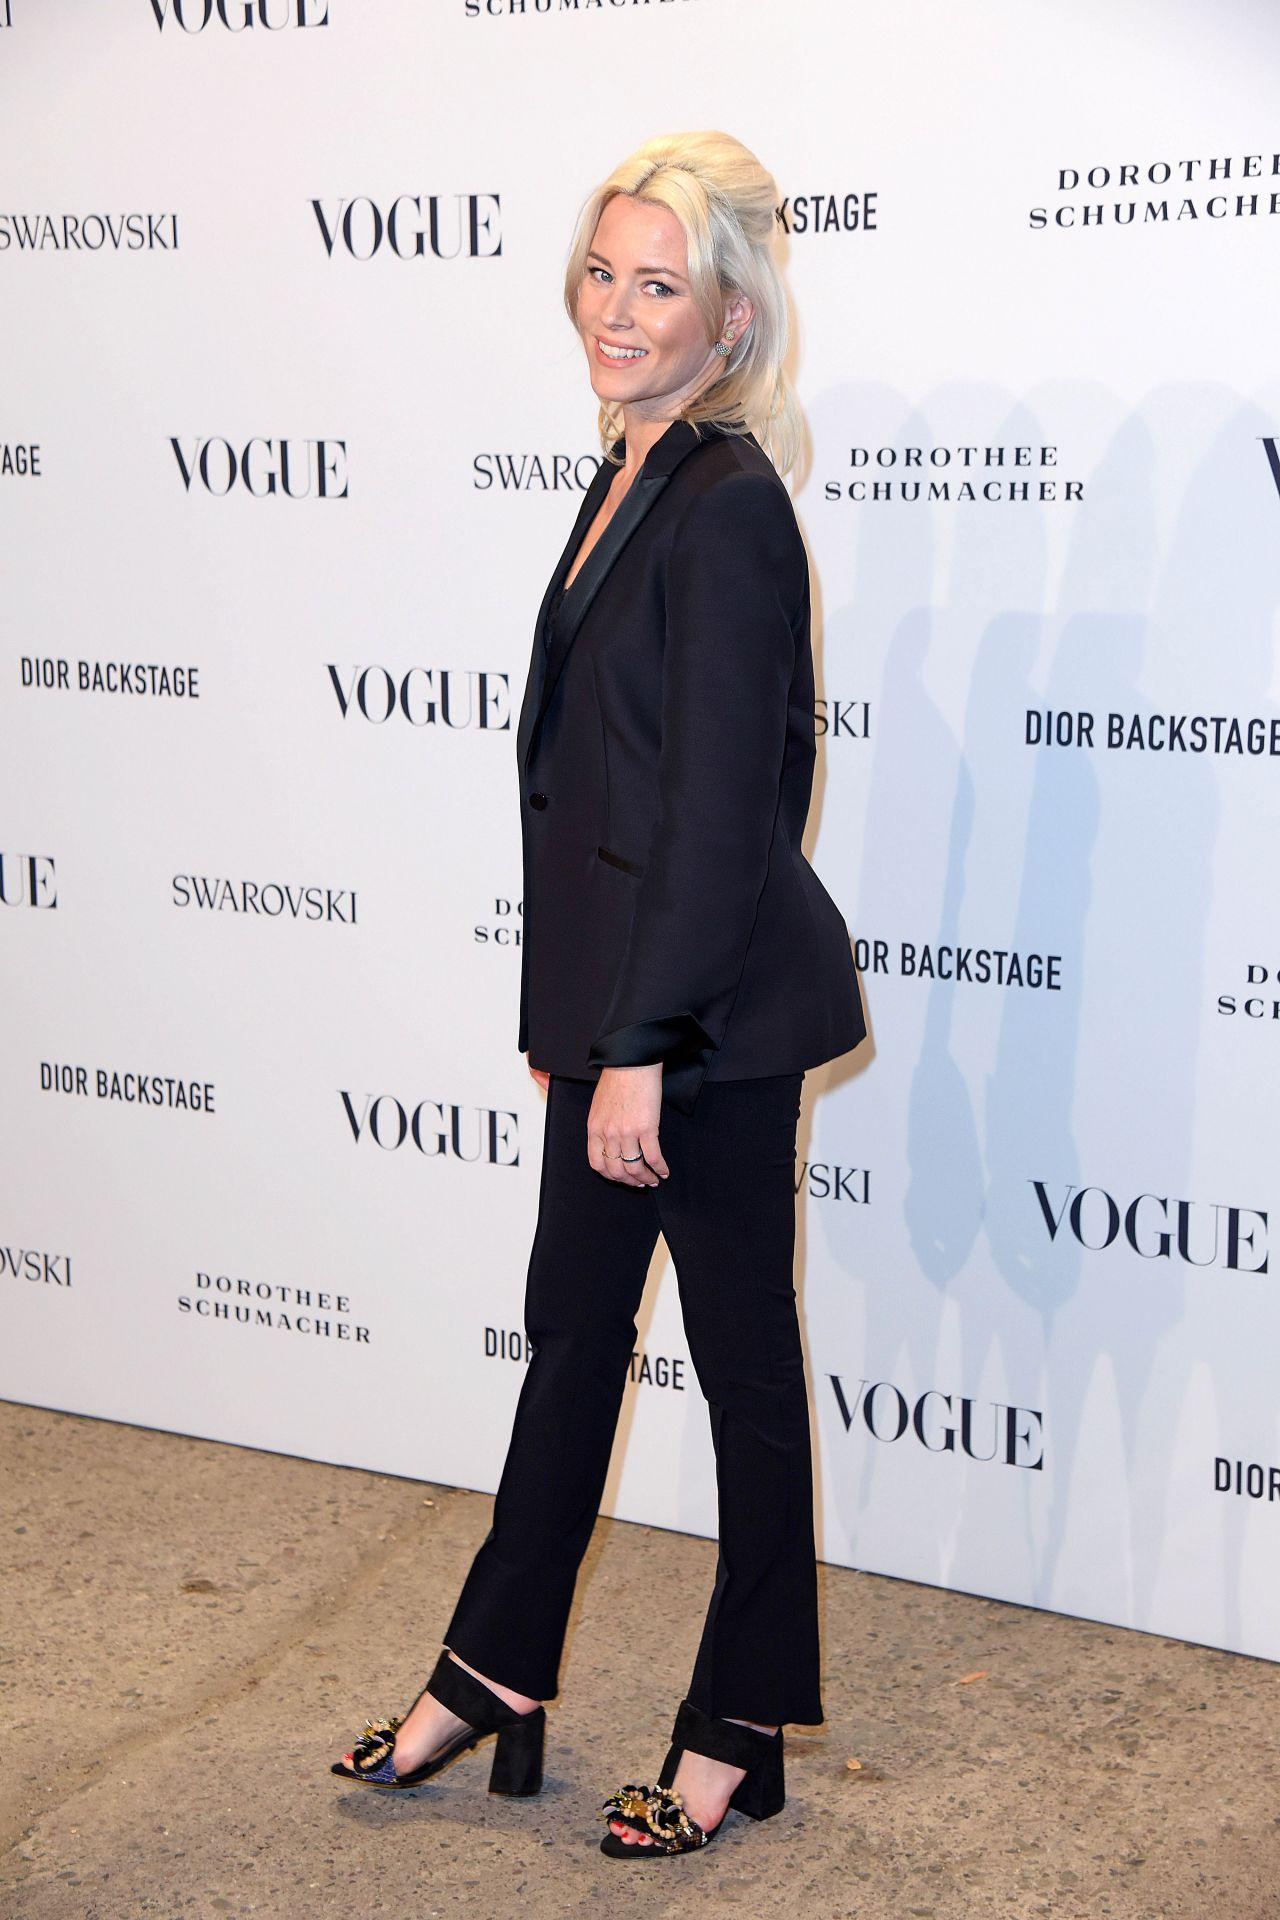 https://celebmafia.com/wp-content/uploads/2018/07/elizabeth-banks-at-vogue-fashion-party-in-berlin-07-06-2018-1.jpg